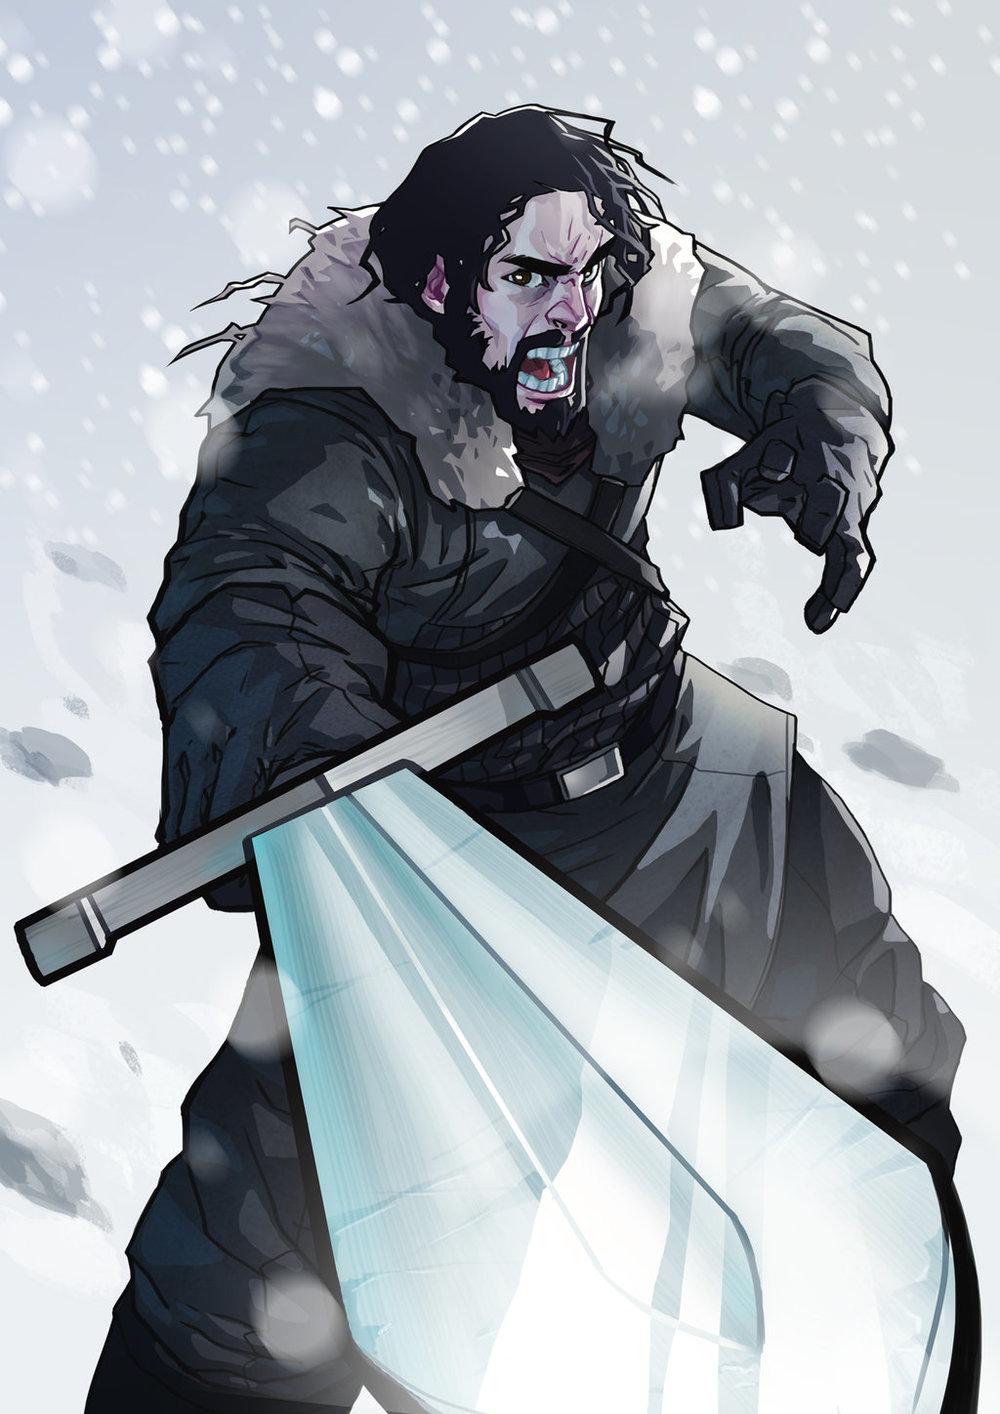 john_snow_by_go_maxpower-d6m1xkg.jpg